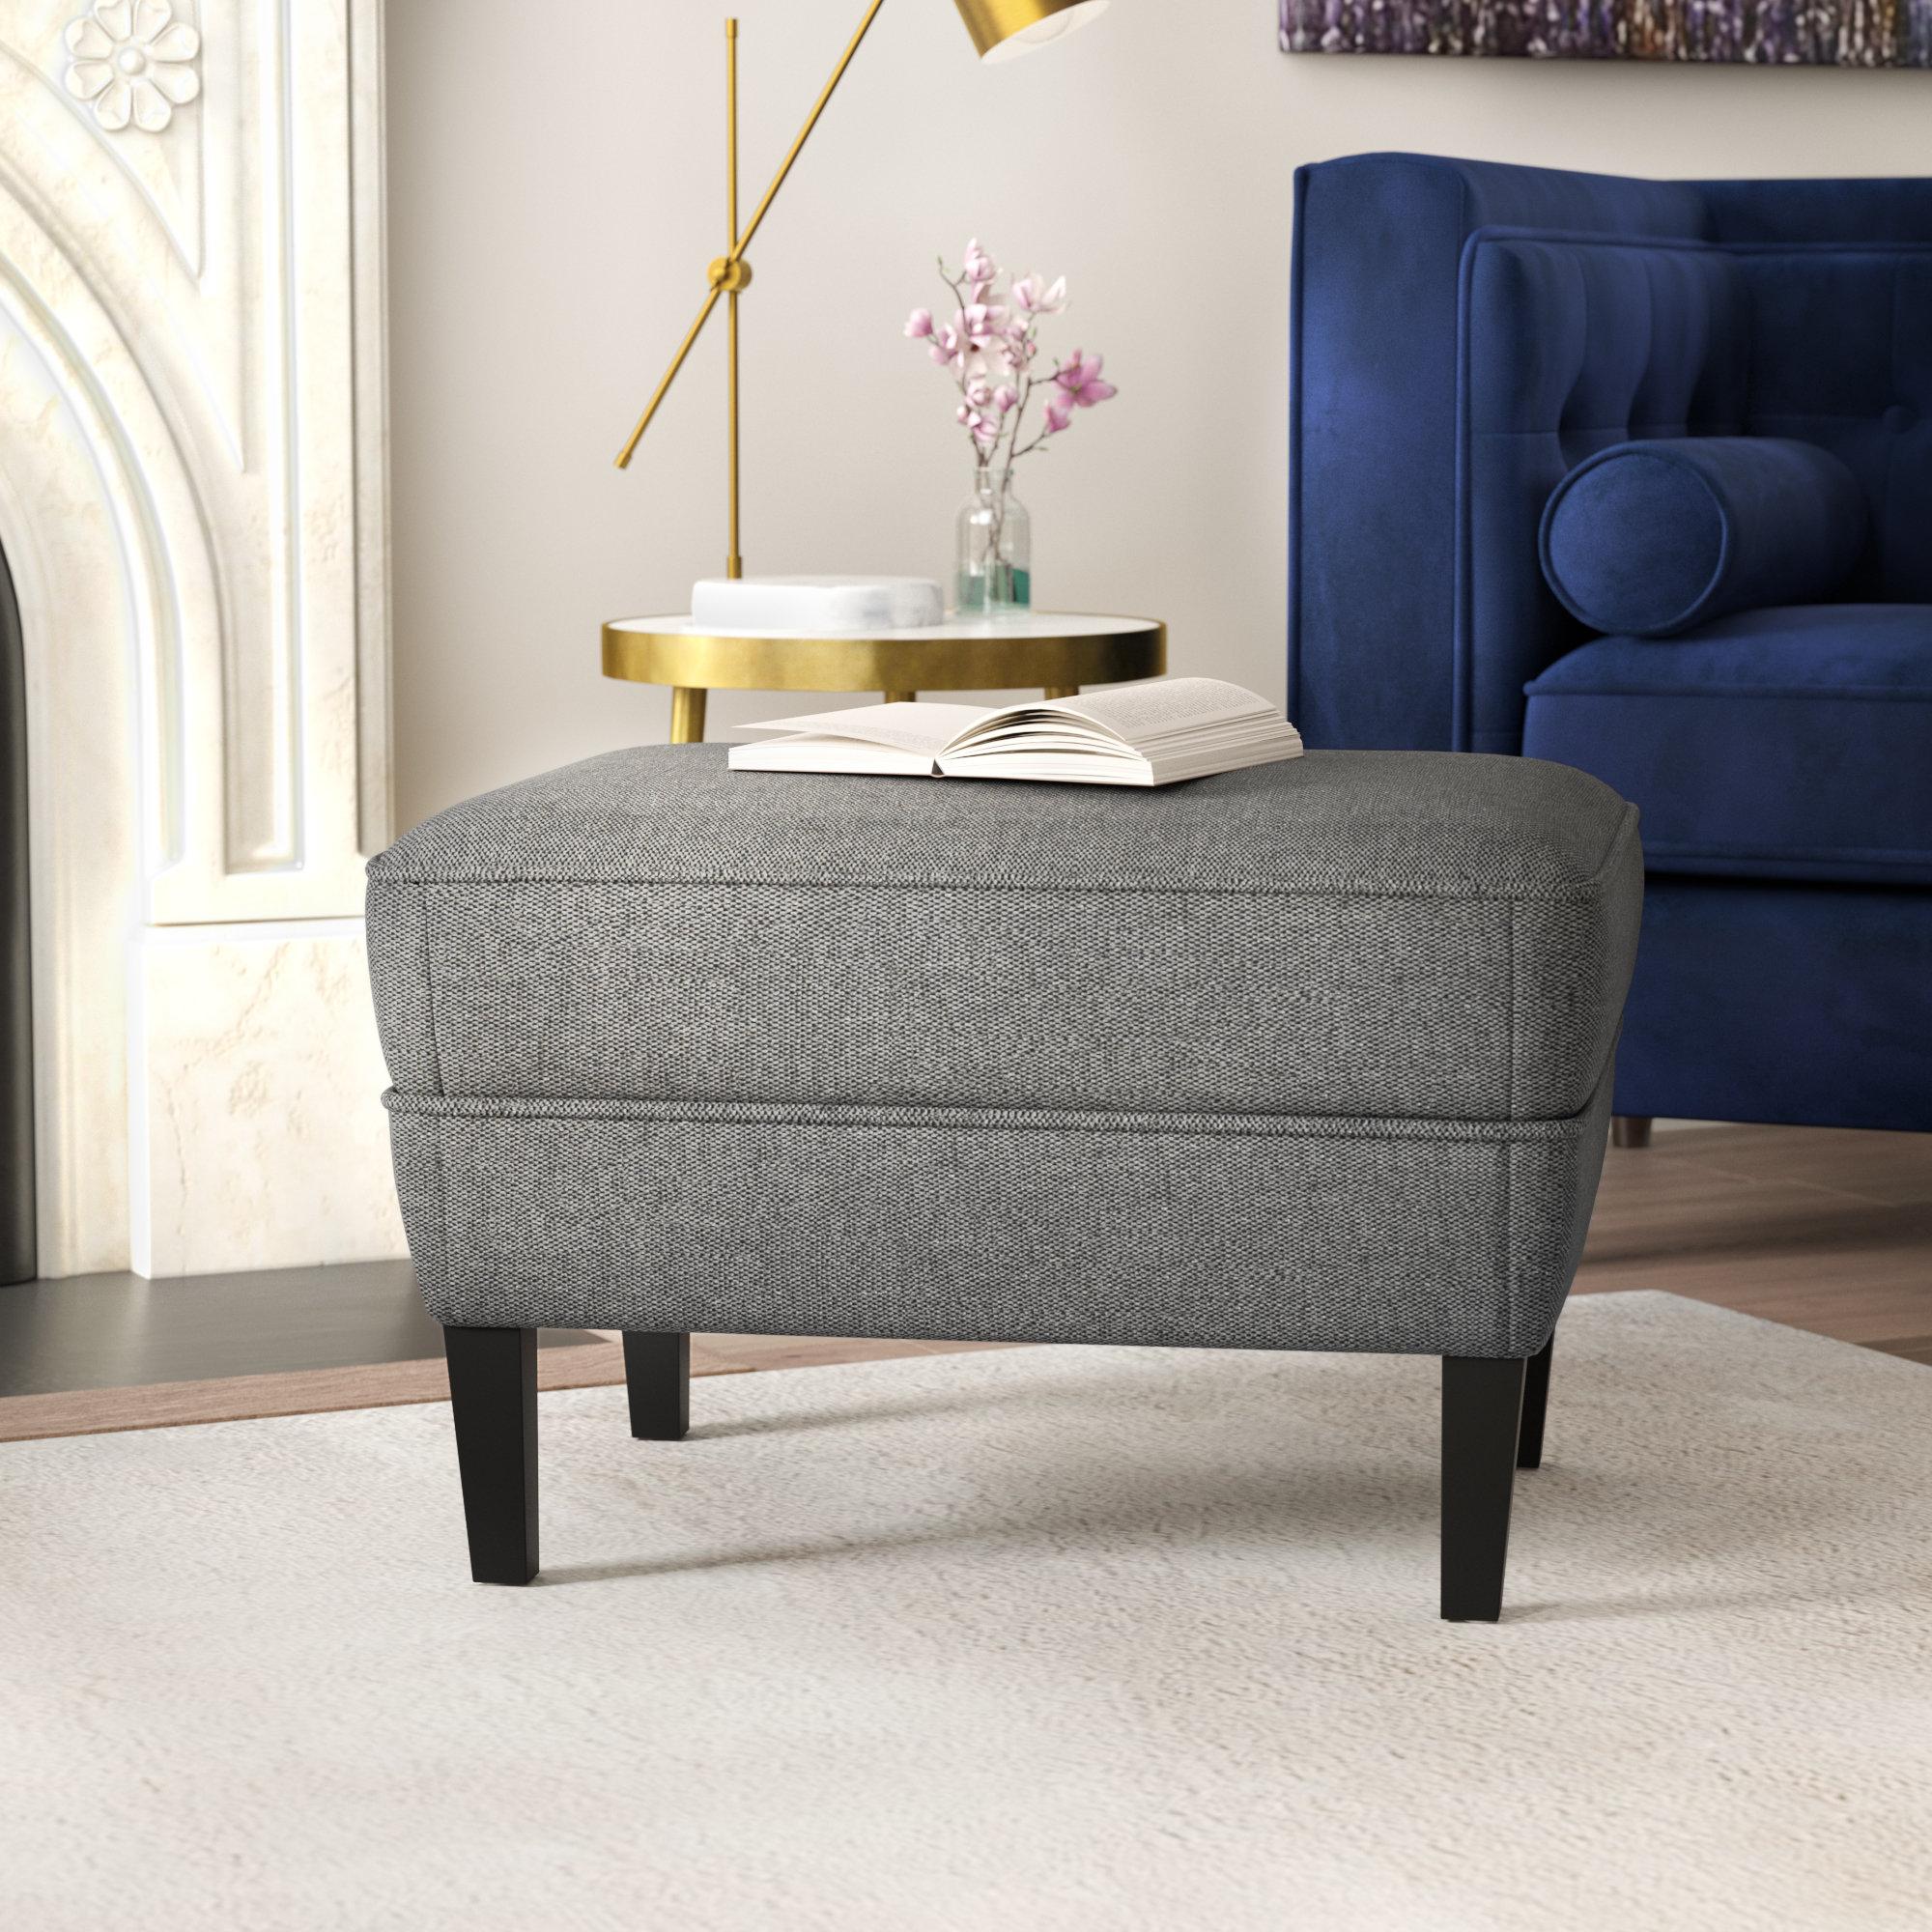 Willa Arlo Interiors Aquarius Ottoman & Reviews | Wayfair In Aquarius Dark Grey Sofa Chairs (Image 19 of 20)